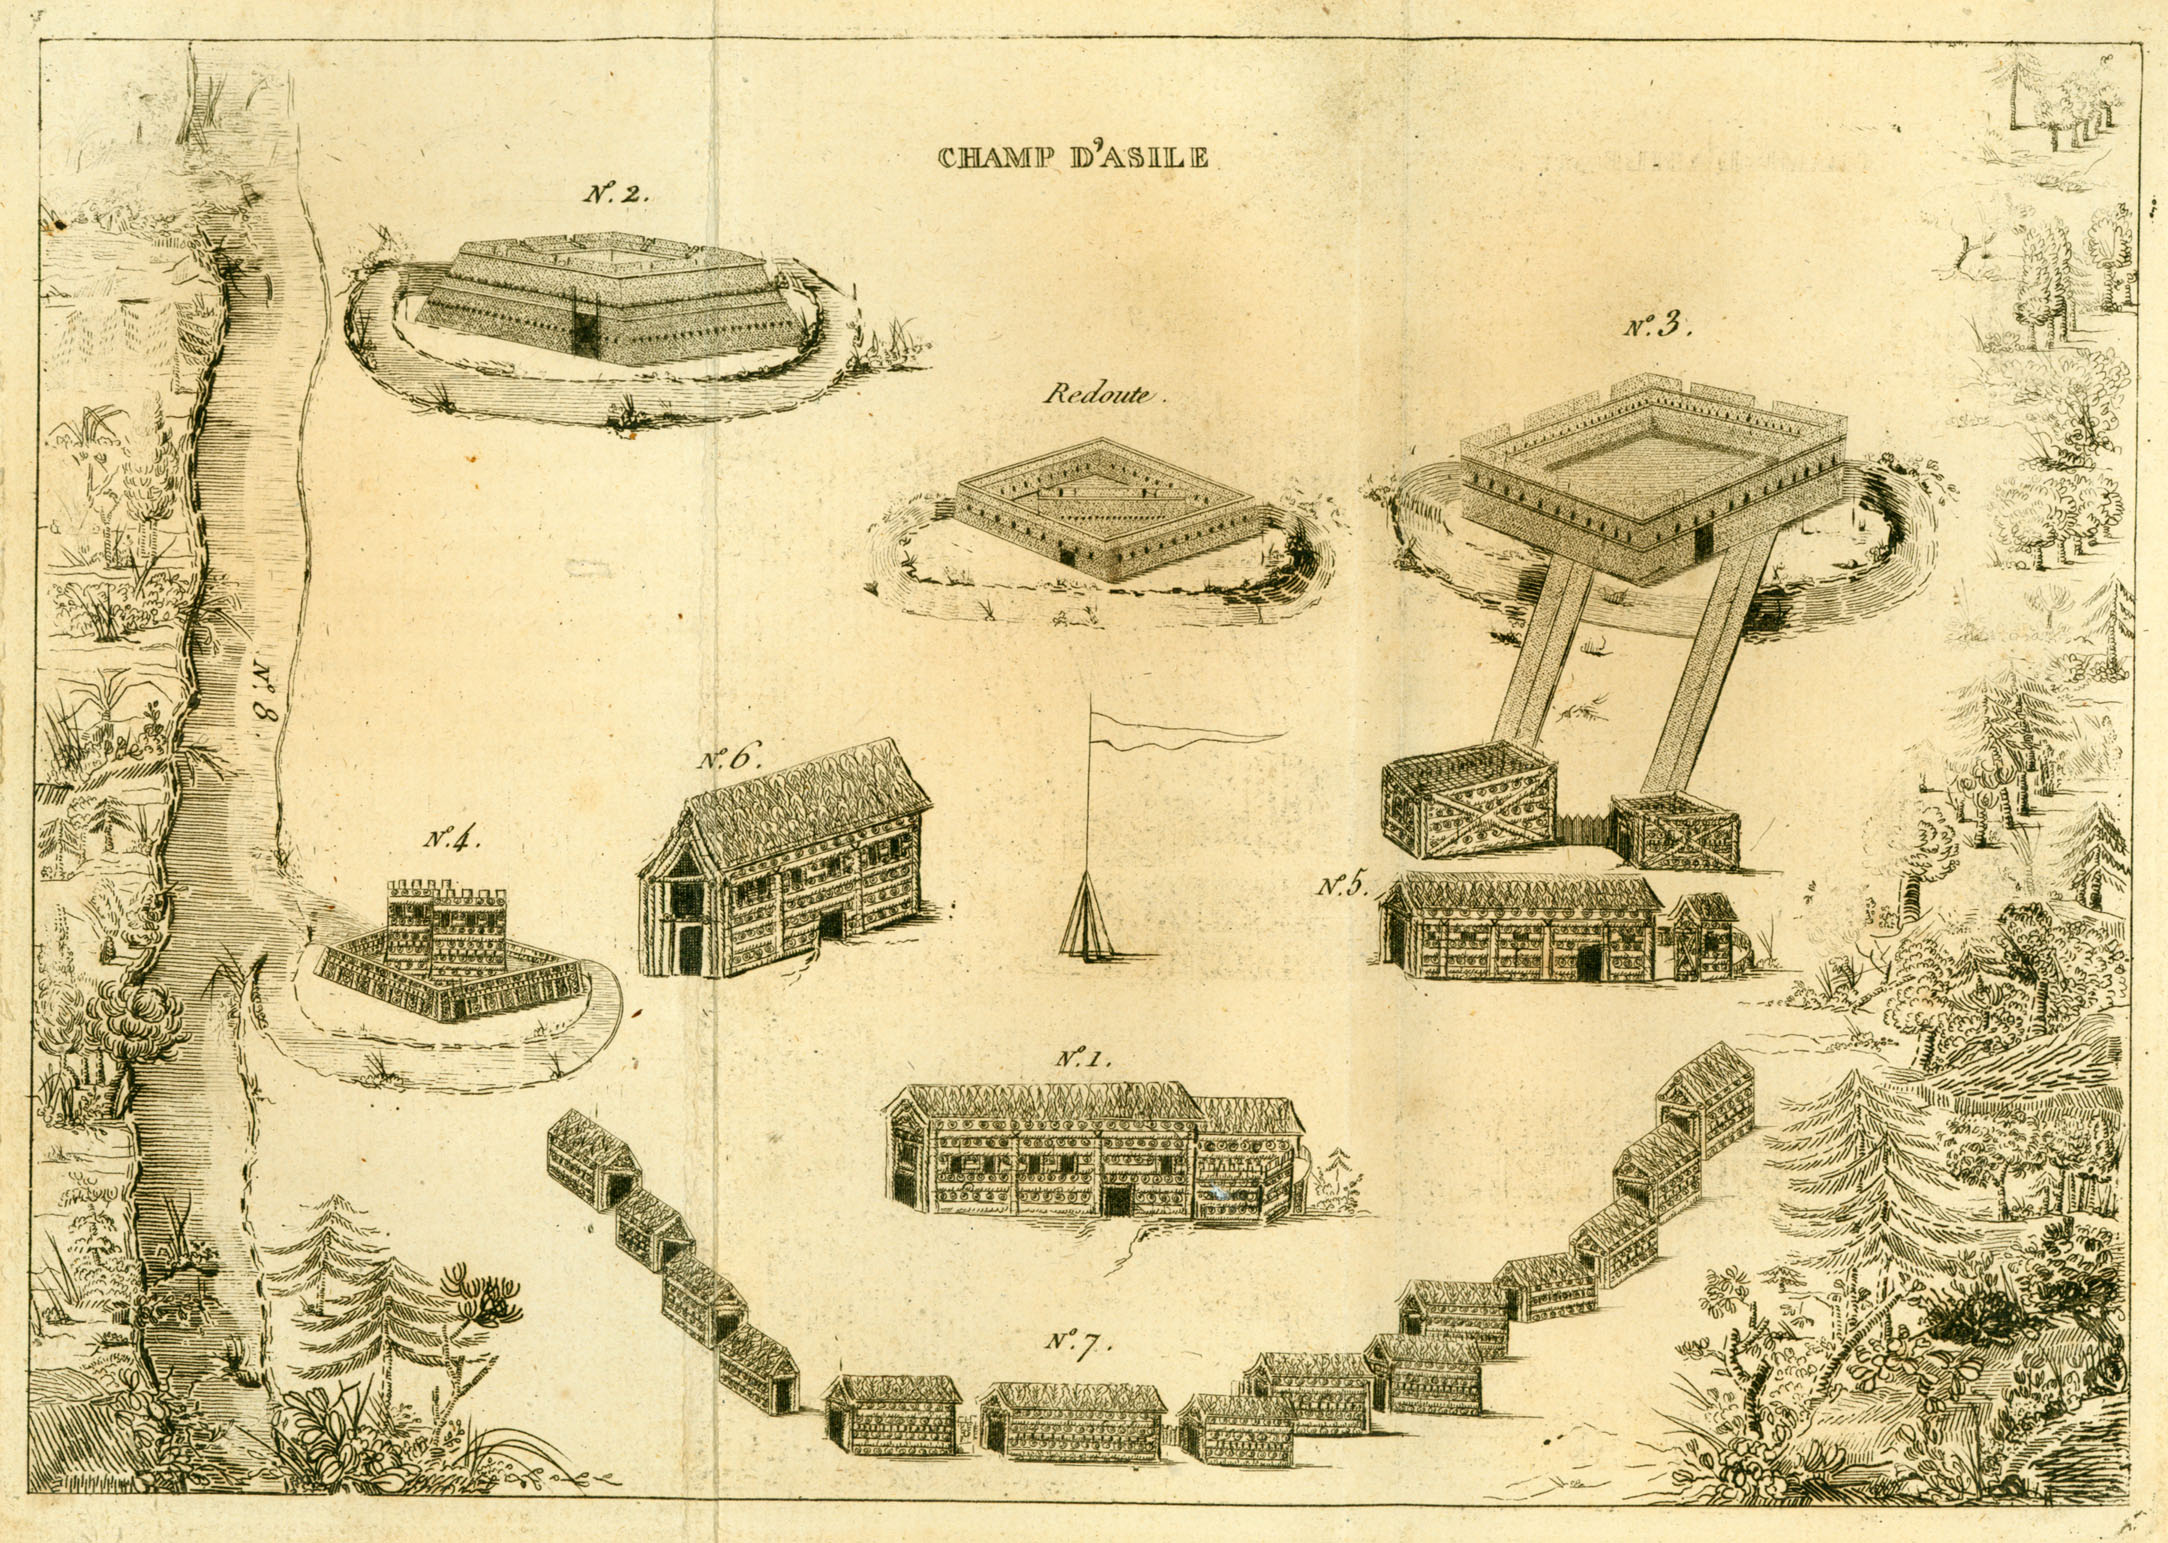 Champ Dasile Texas 1819 Map Texas Mappery